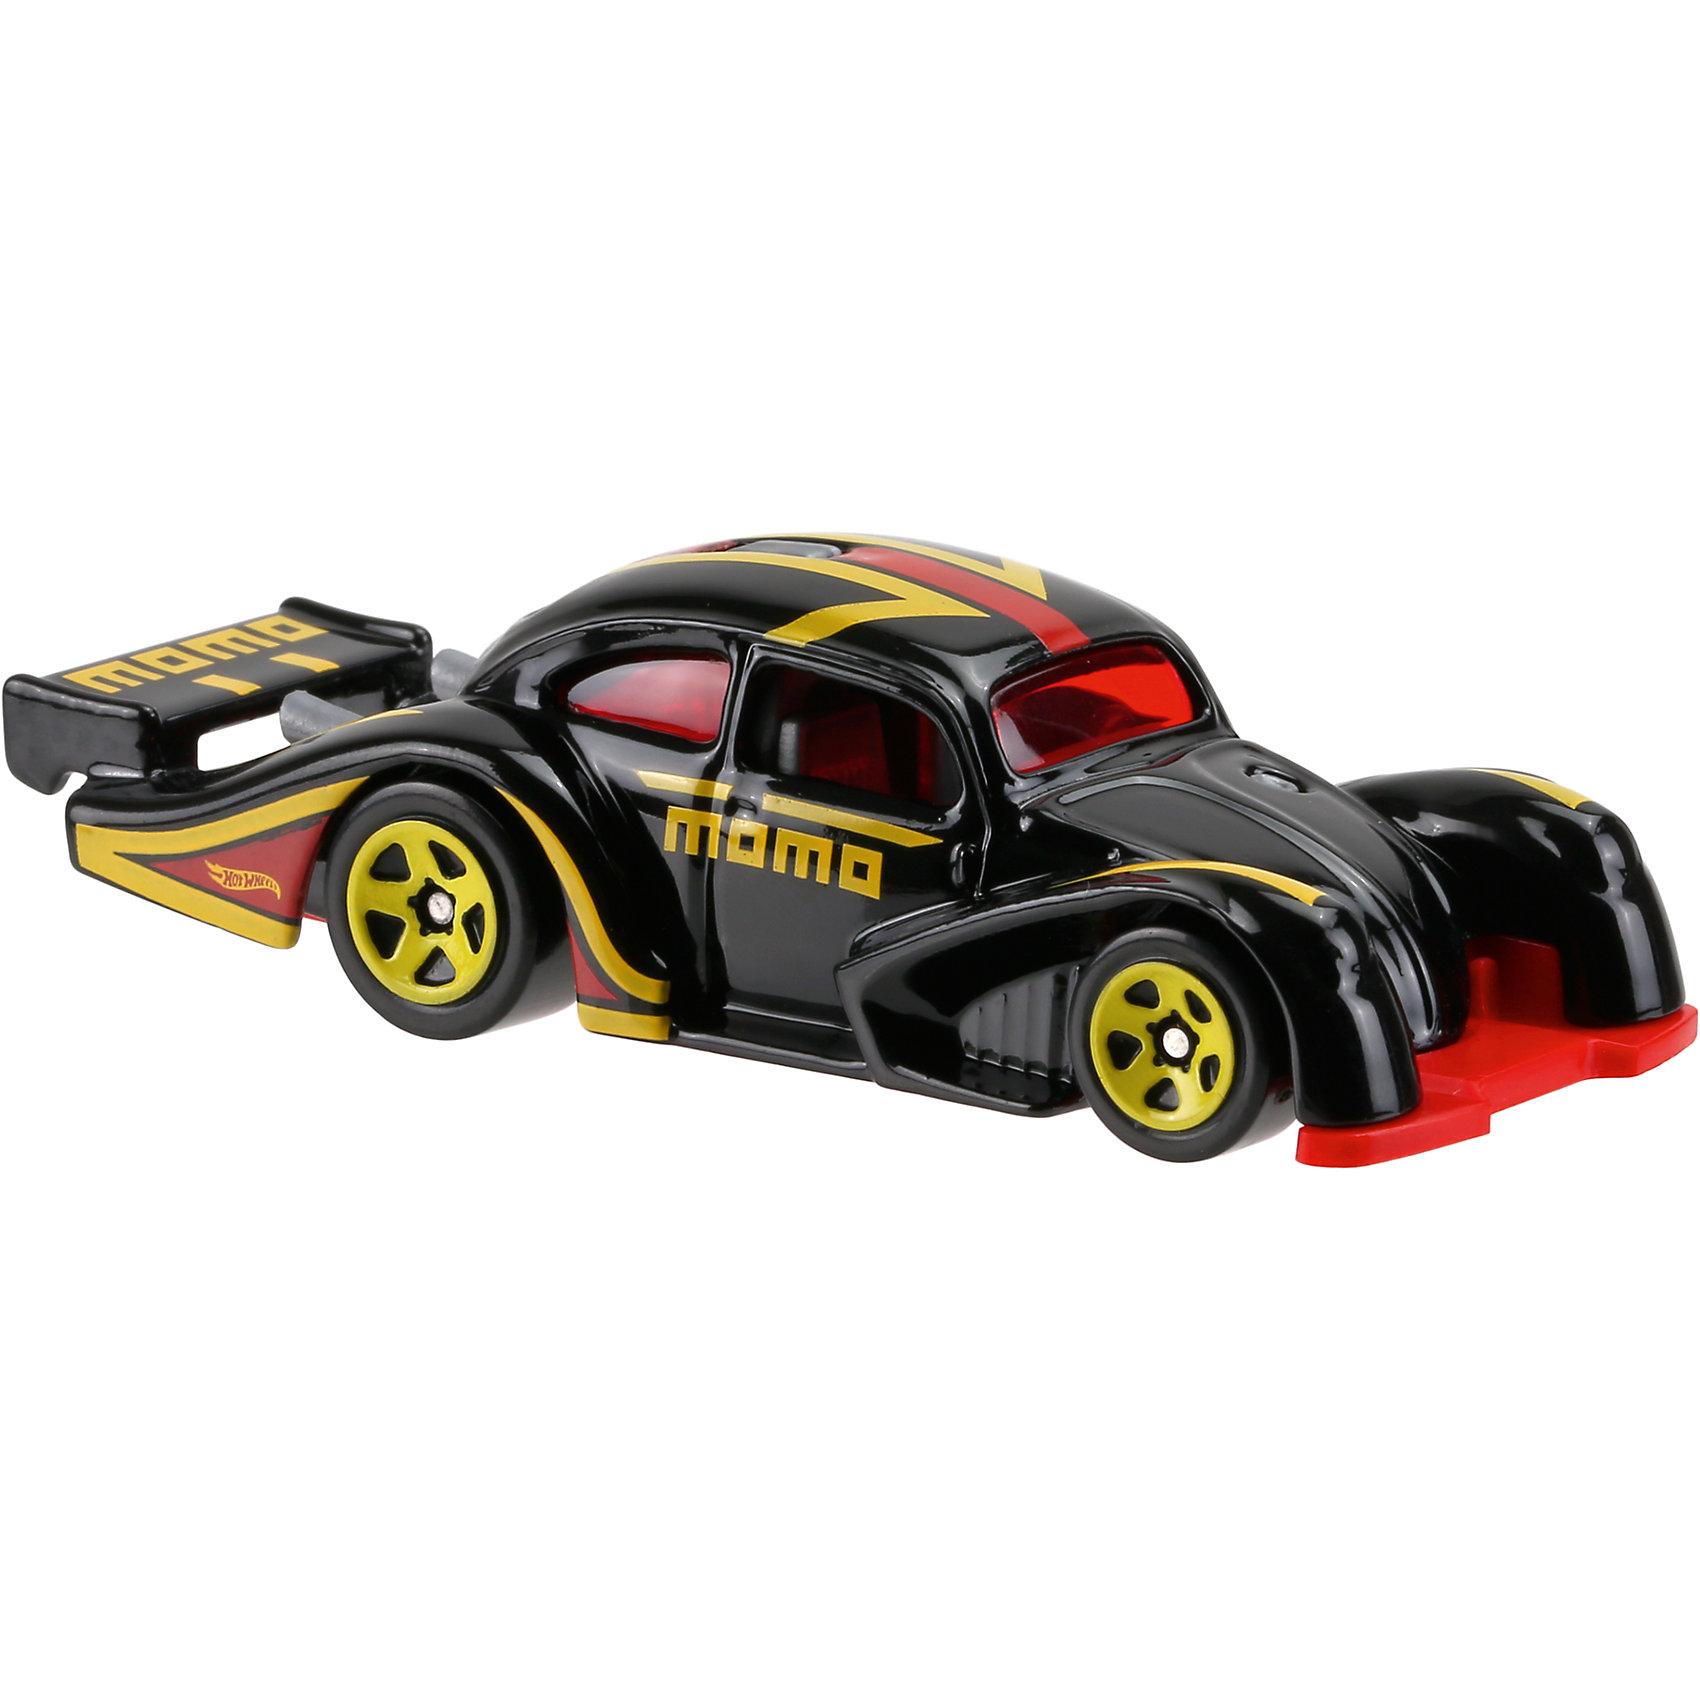 Базовая машинка Hot Wheels, Volkswagen Kafer RacerМашинки<br><br><br>Ширина мм: 110<br>Глубина мм: 45<br>Высота мм: 110<br>Вес г: 30<br>Возраст от месяцев: 36<br>Возраст до месяцев: 96<br>Пол: Мужской<br>Возраст: Детский<br>SKU: 7142090